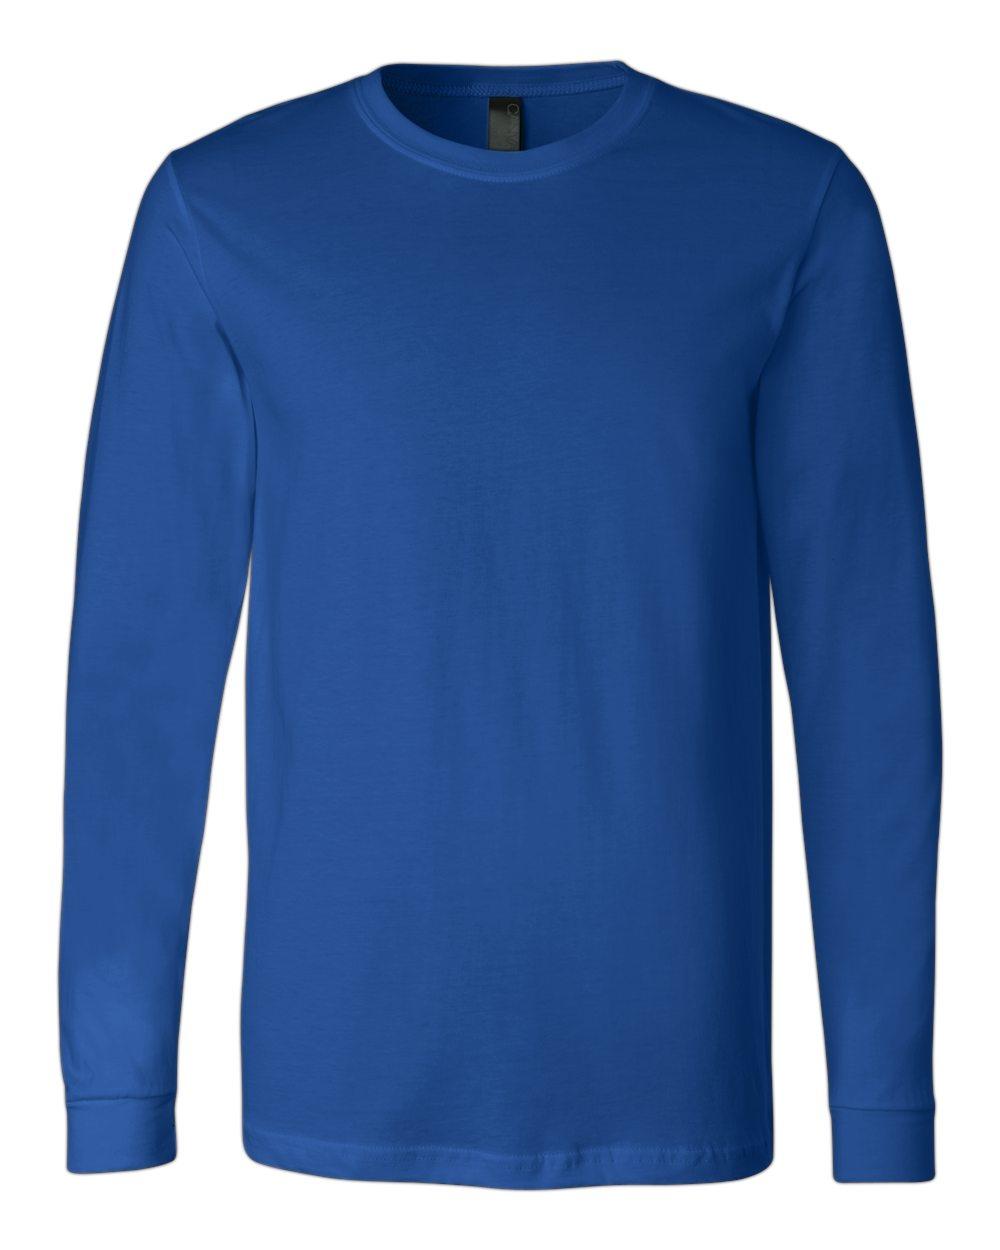 Bella-Canvas-Mens-Blank-Top-Long-Sleeve-Jersey-Tee-T-Shirt-3501-up-to-3XL thumbnail 110